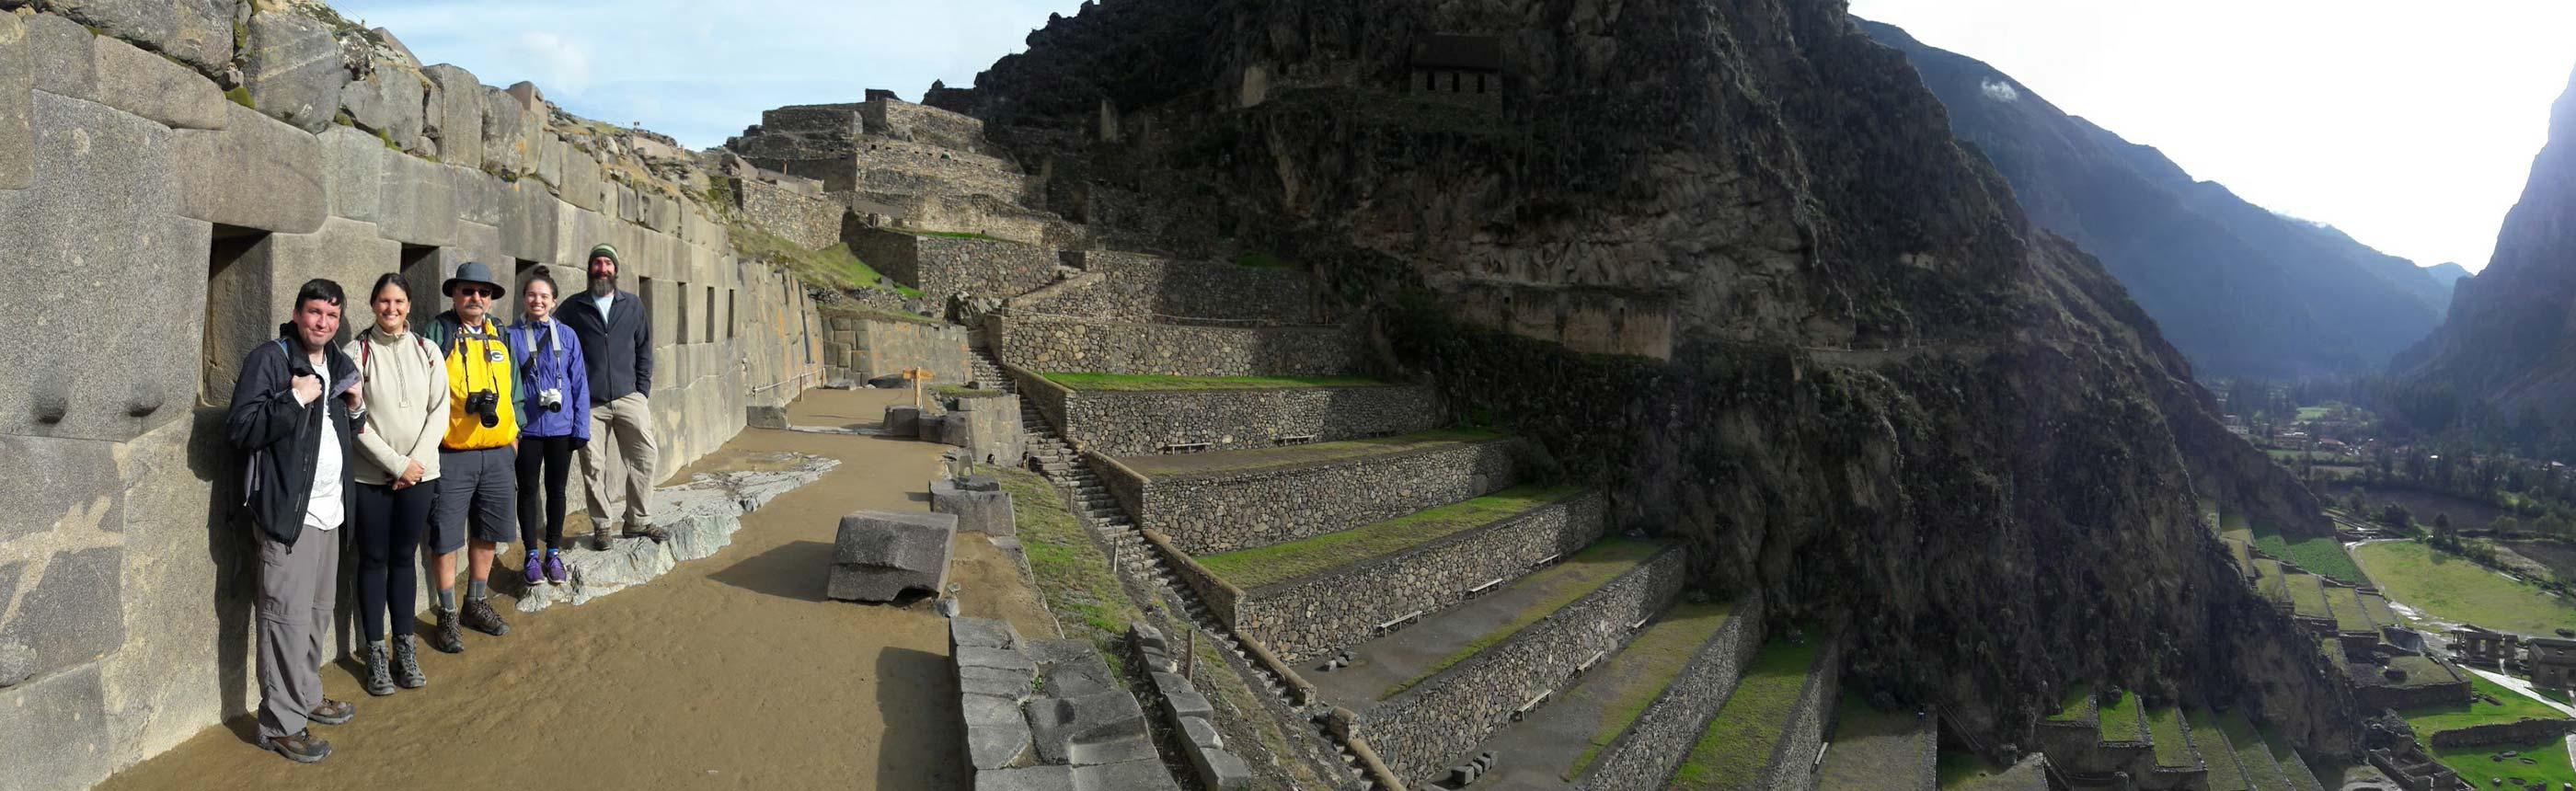 Tour to Machu Picchu Express - 3 Days / 2 Nights